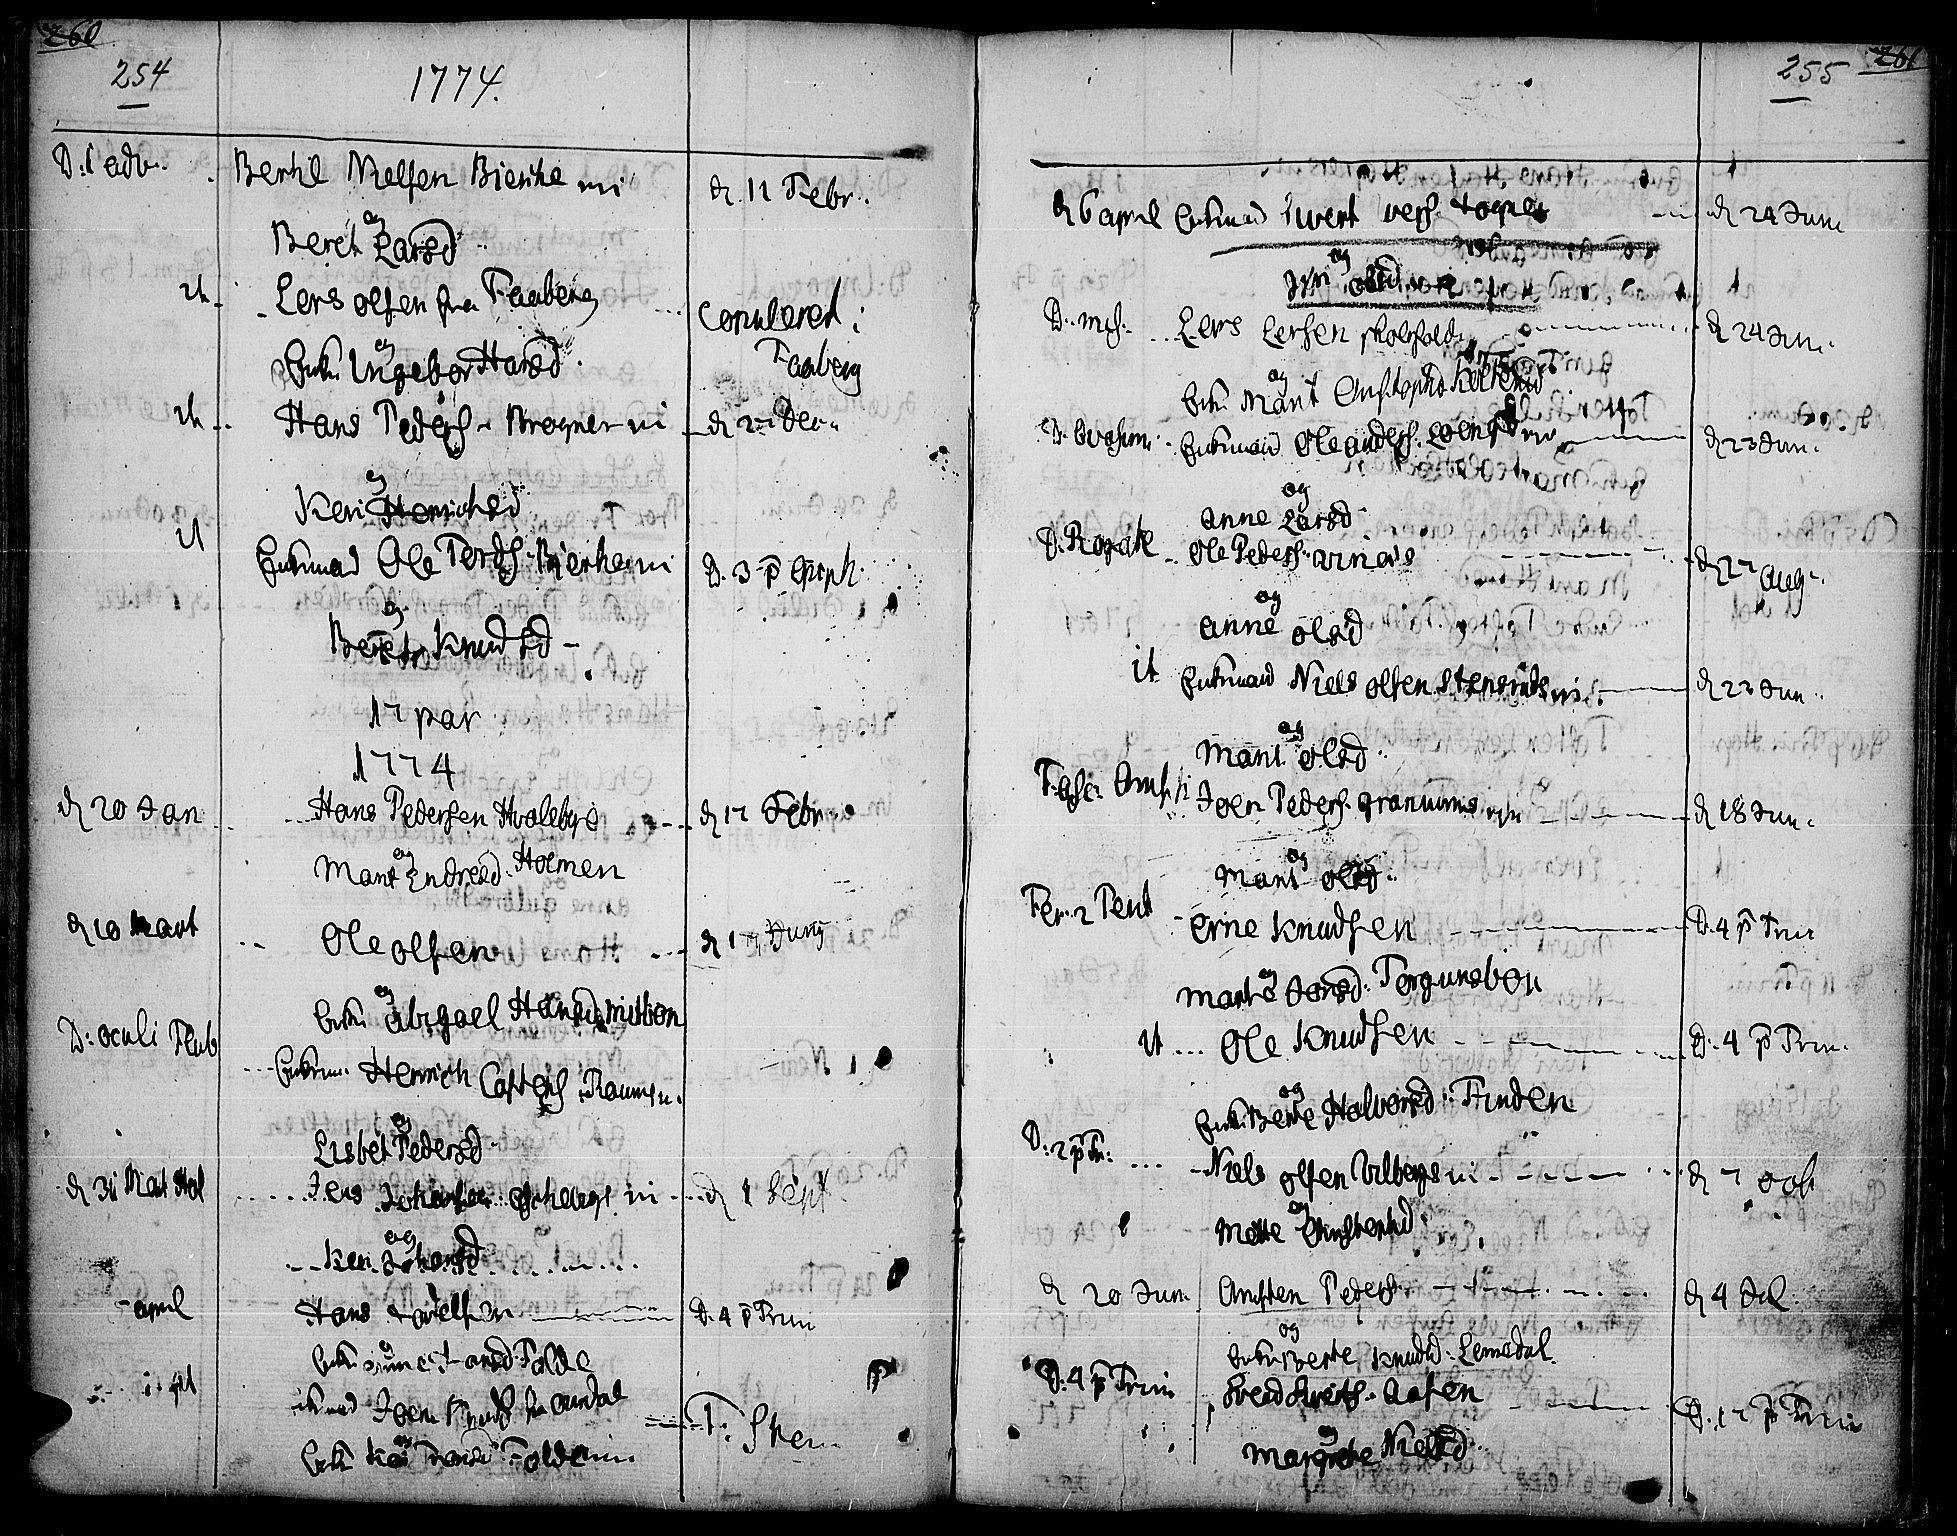 SAH, Land prestekontor, Ministerialbok nr. 5, 1765-1784, s. 254-255